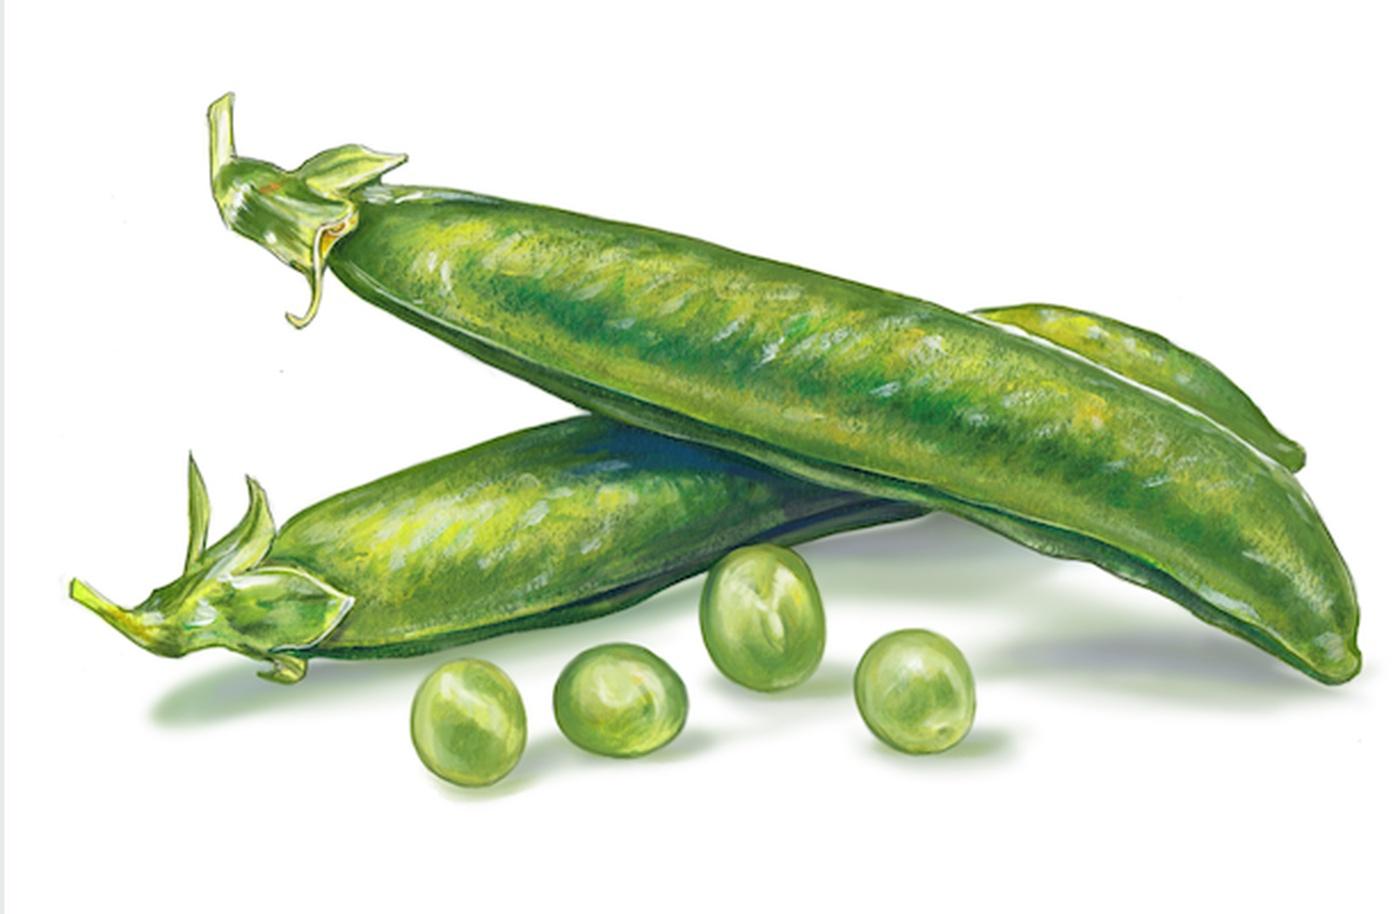 Haricots Verts Dessin Inspirant Photos Illustration Québec Jocelyne Bouchard Emballage